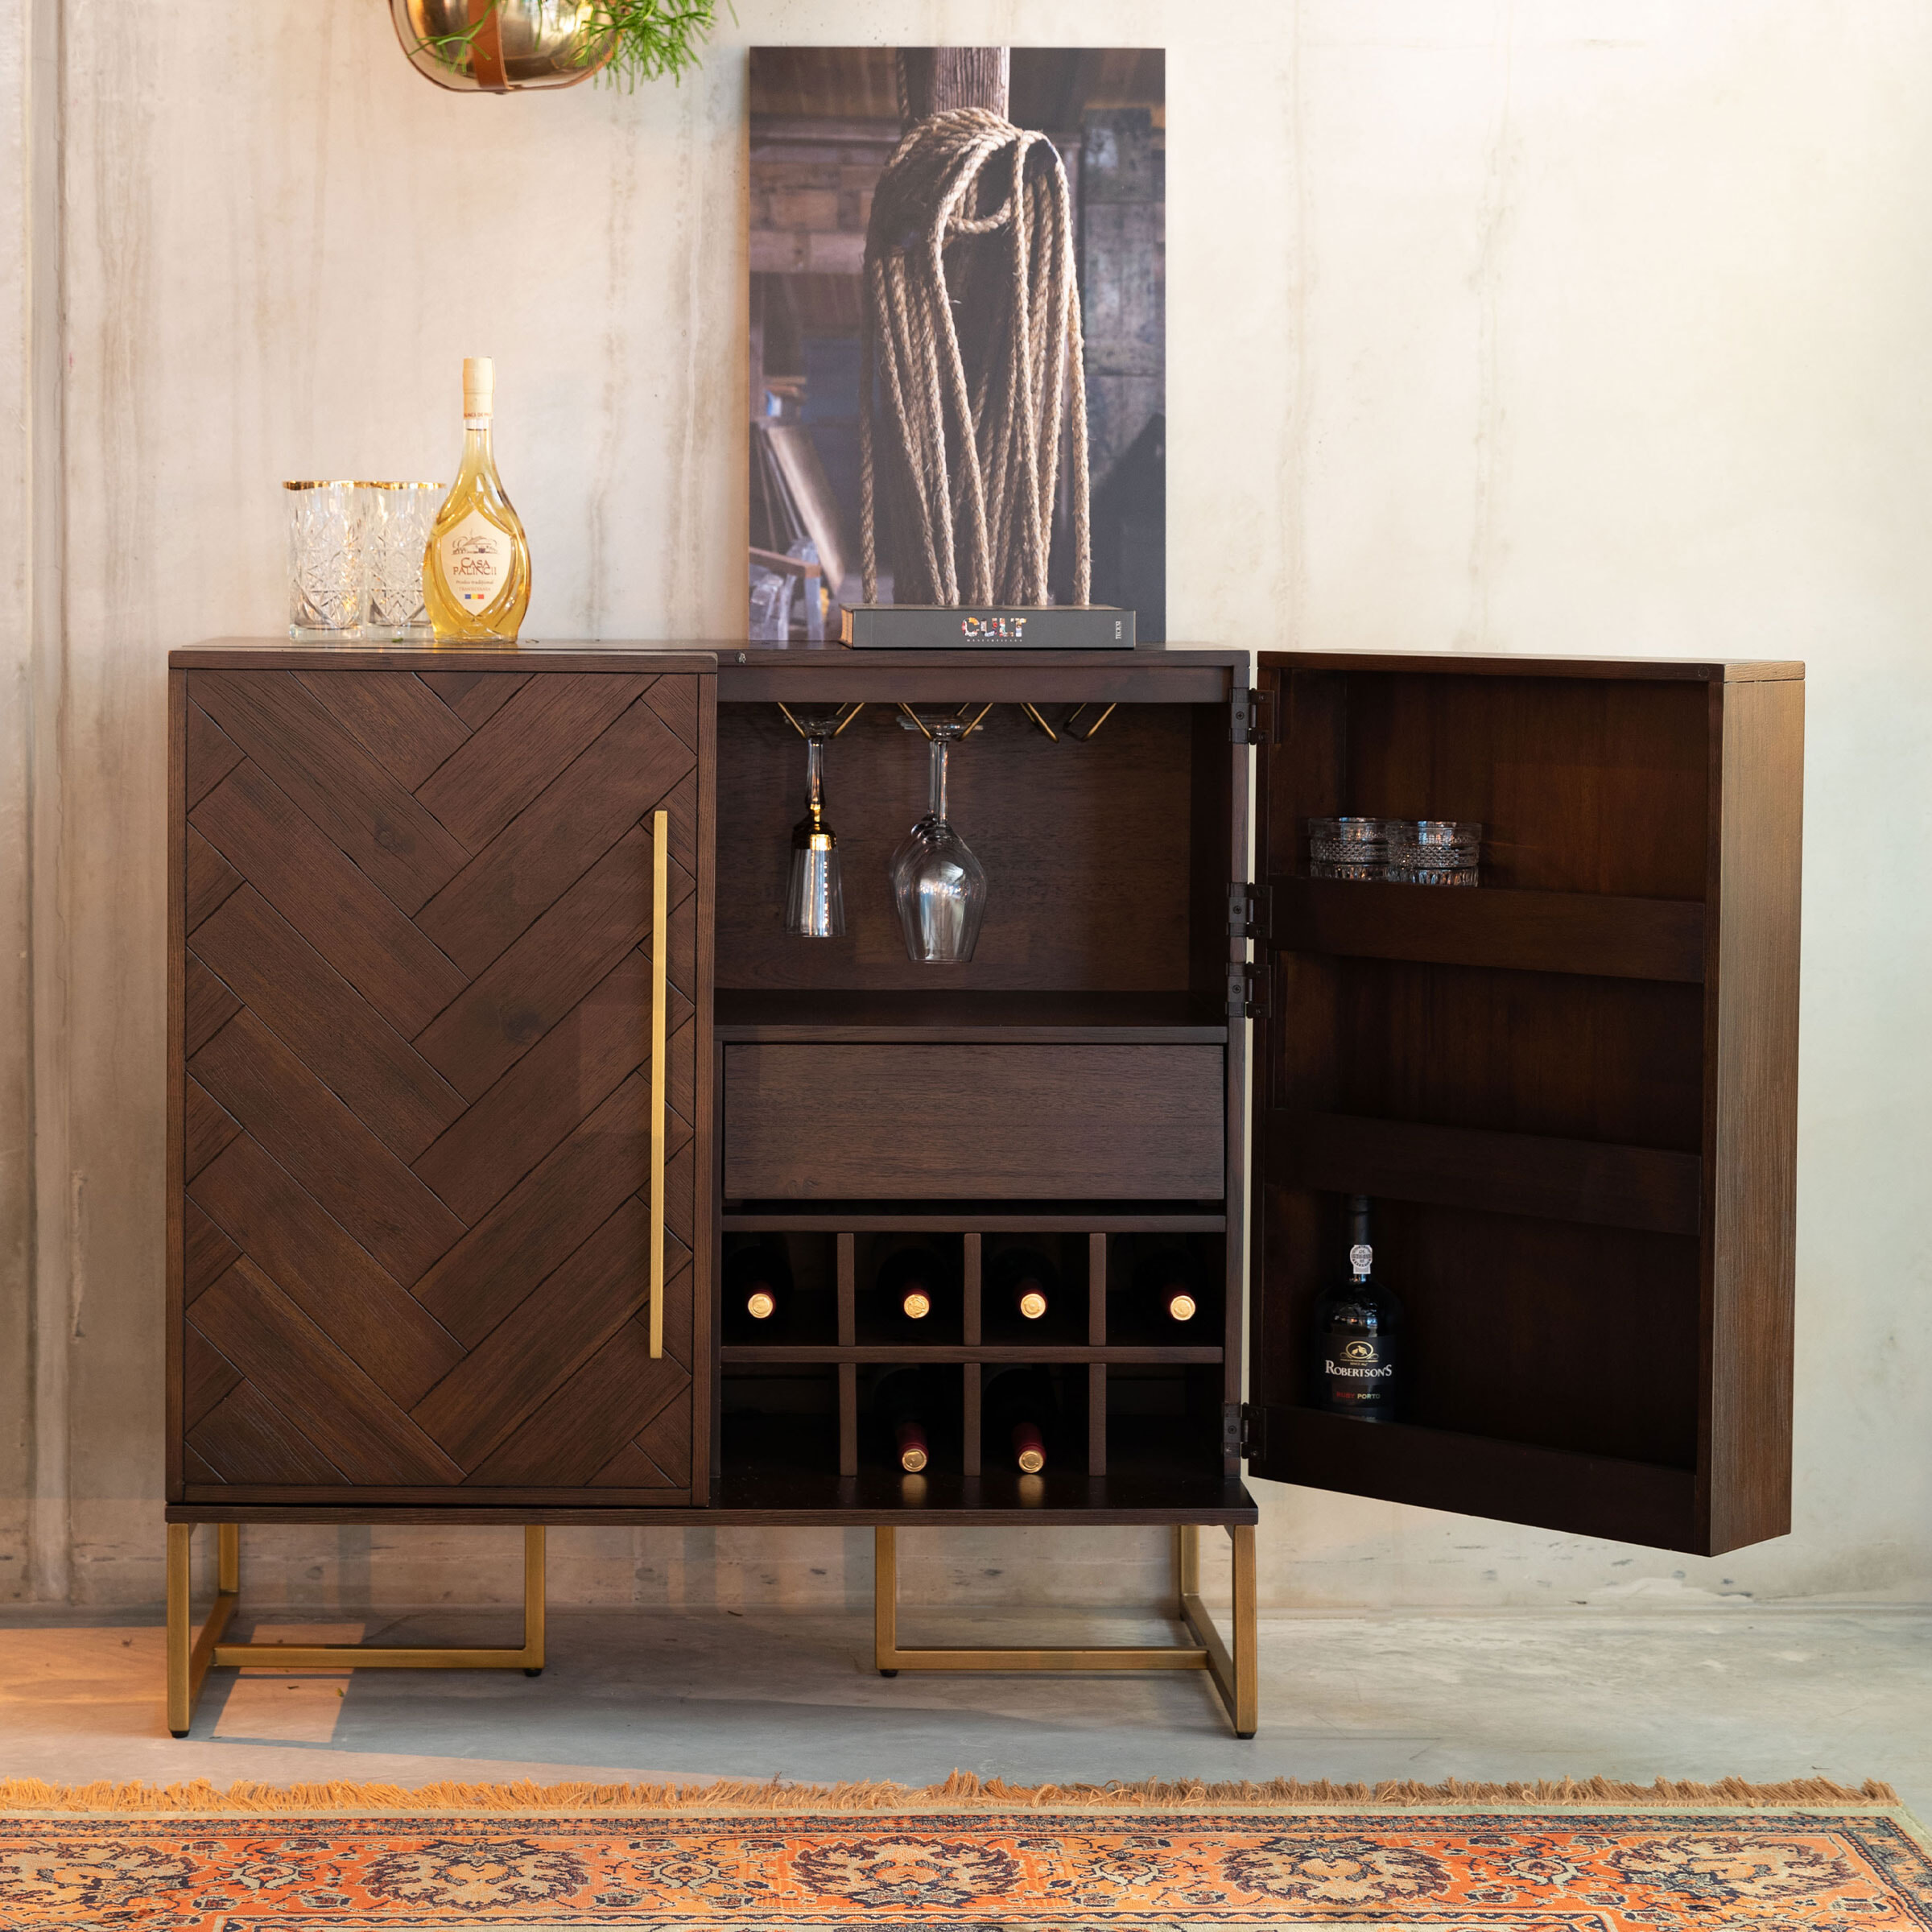 Dutchbone Wijnkast 'Class' Antique Brass, 100 x 100cm